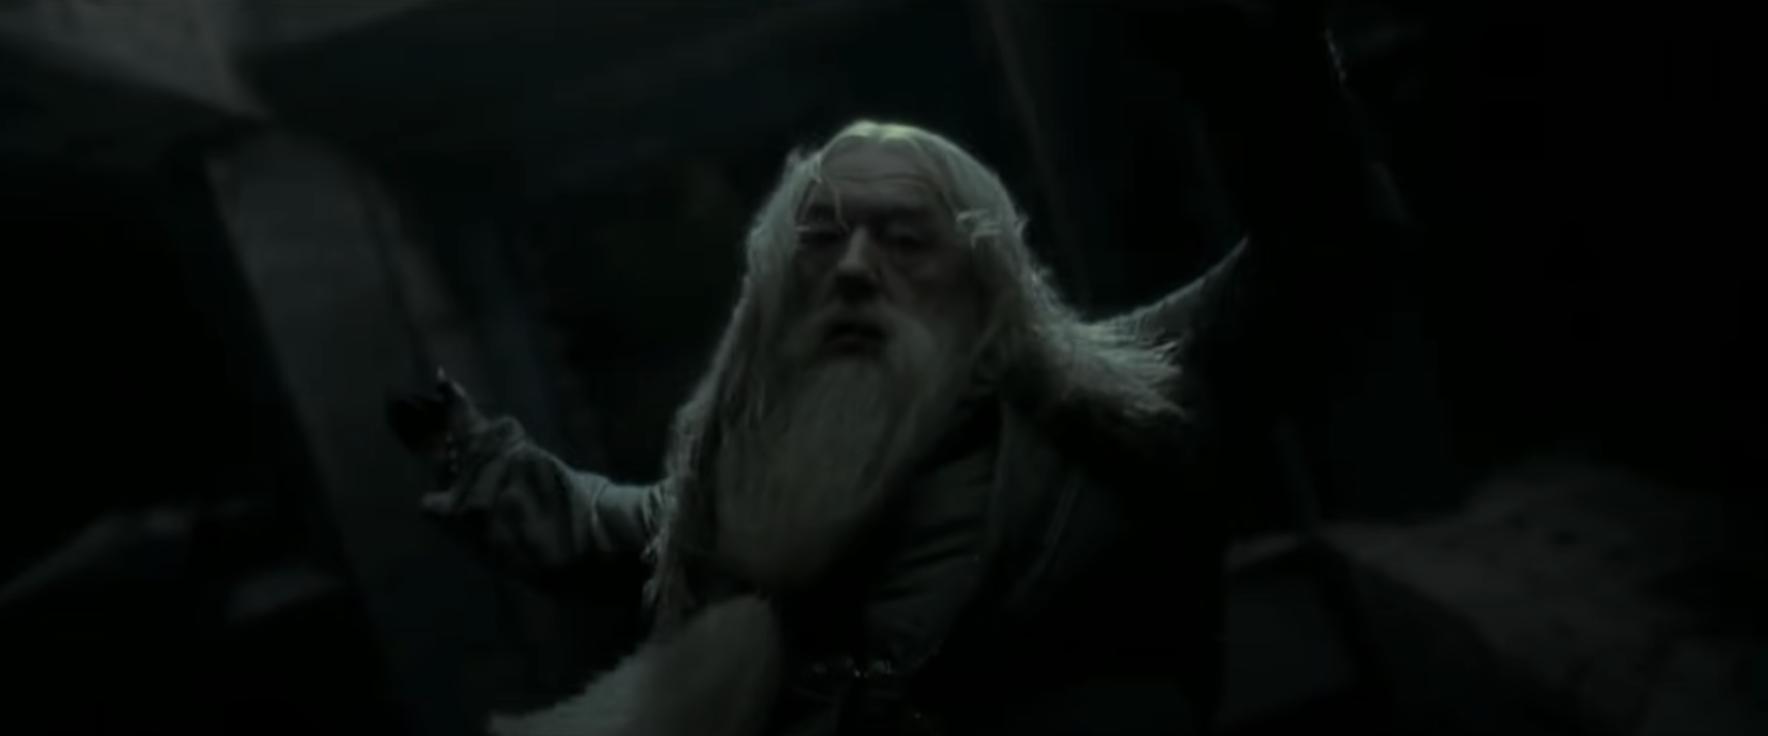 Dumbledore's death scene